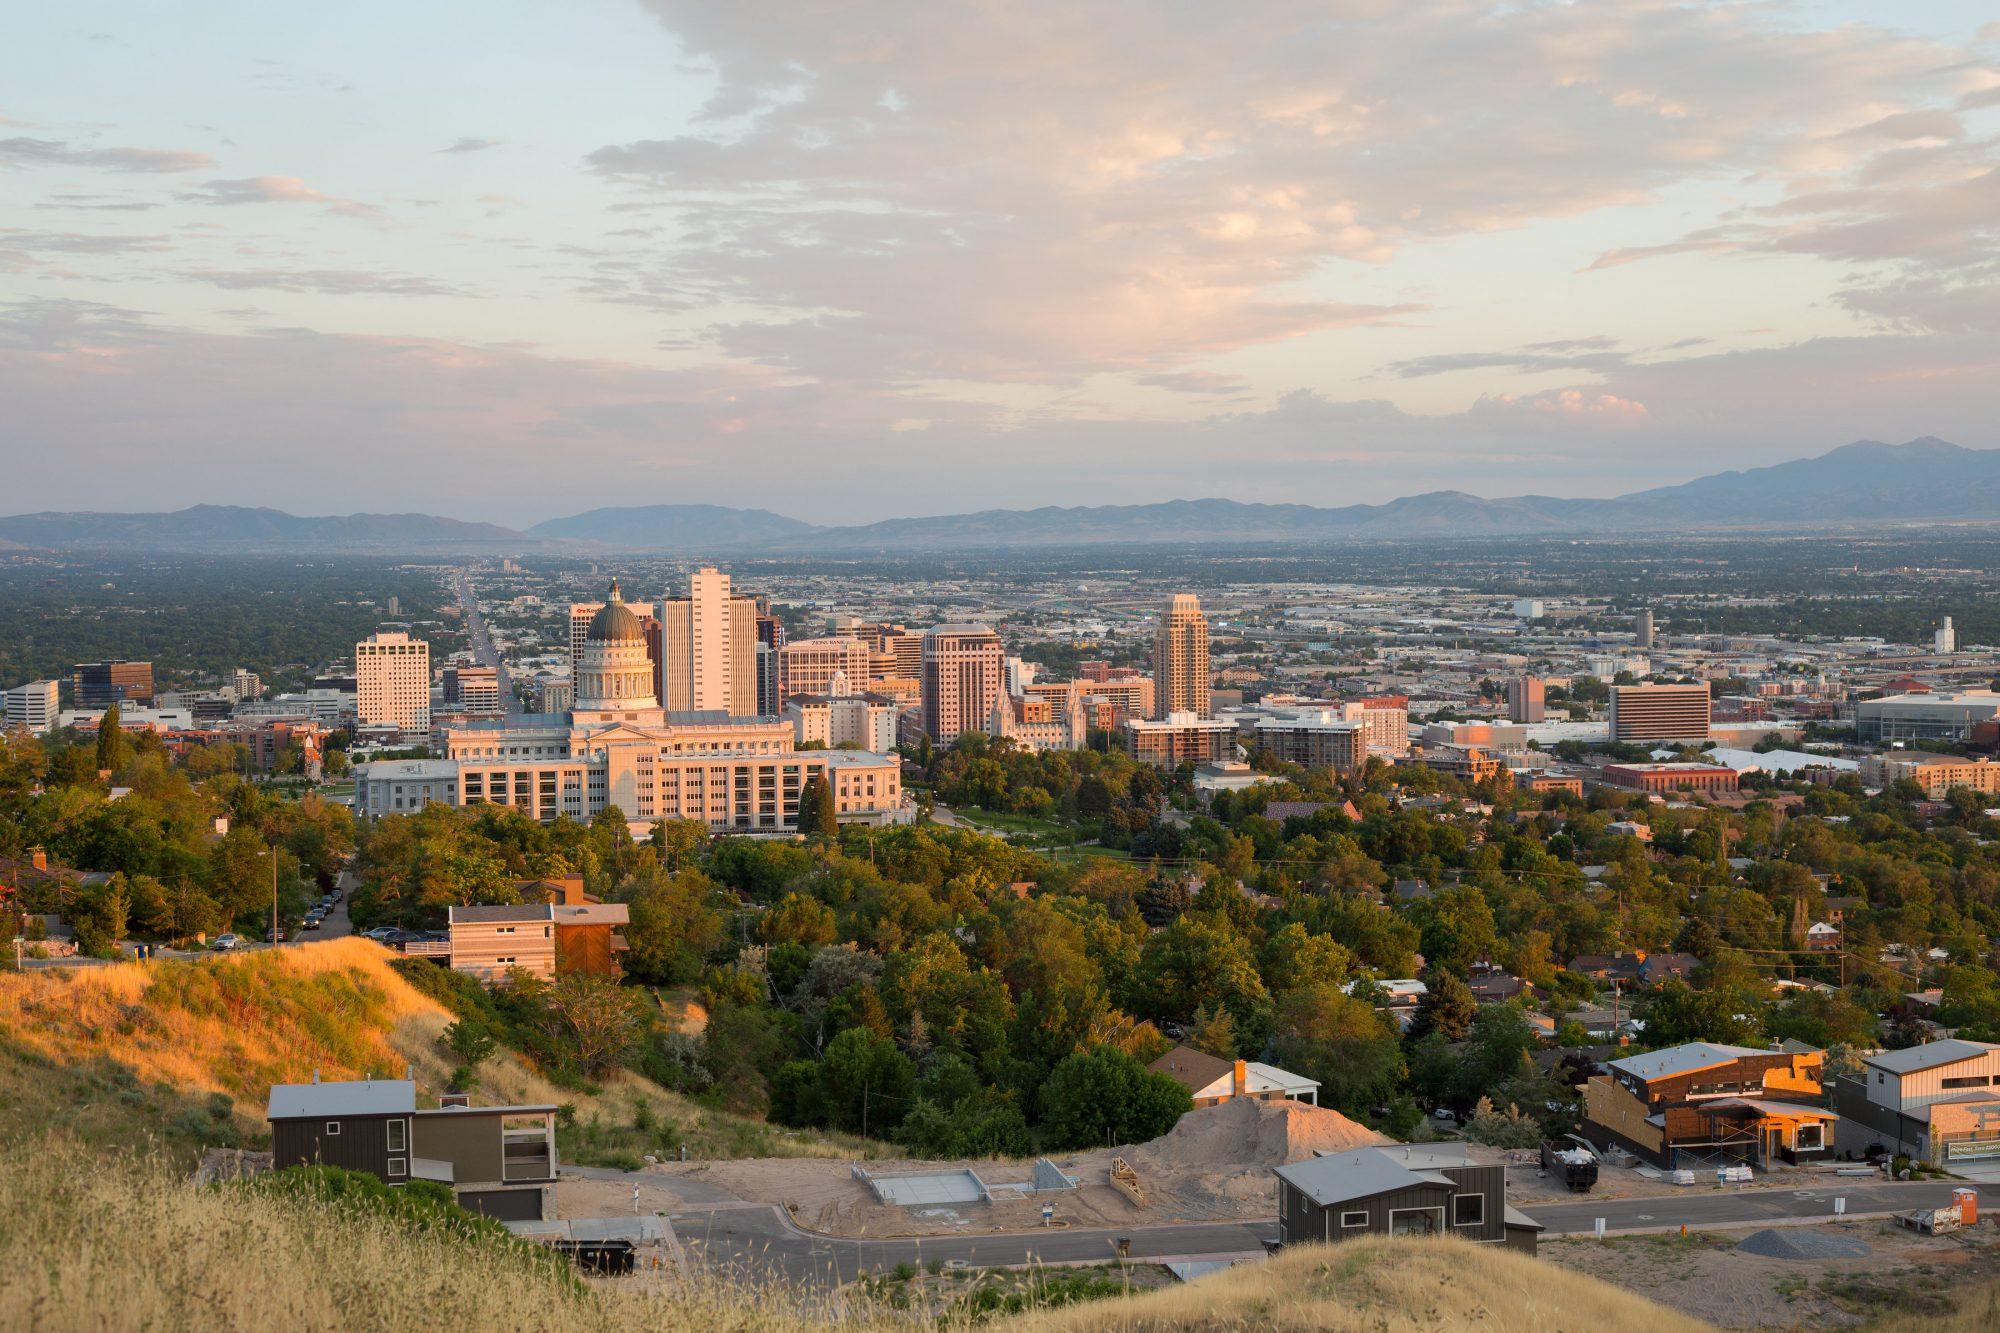 Salt Lake City at sunset